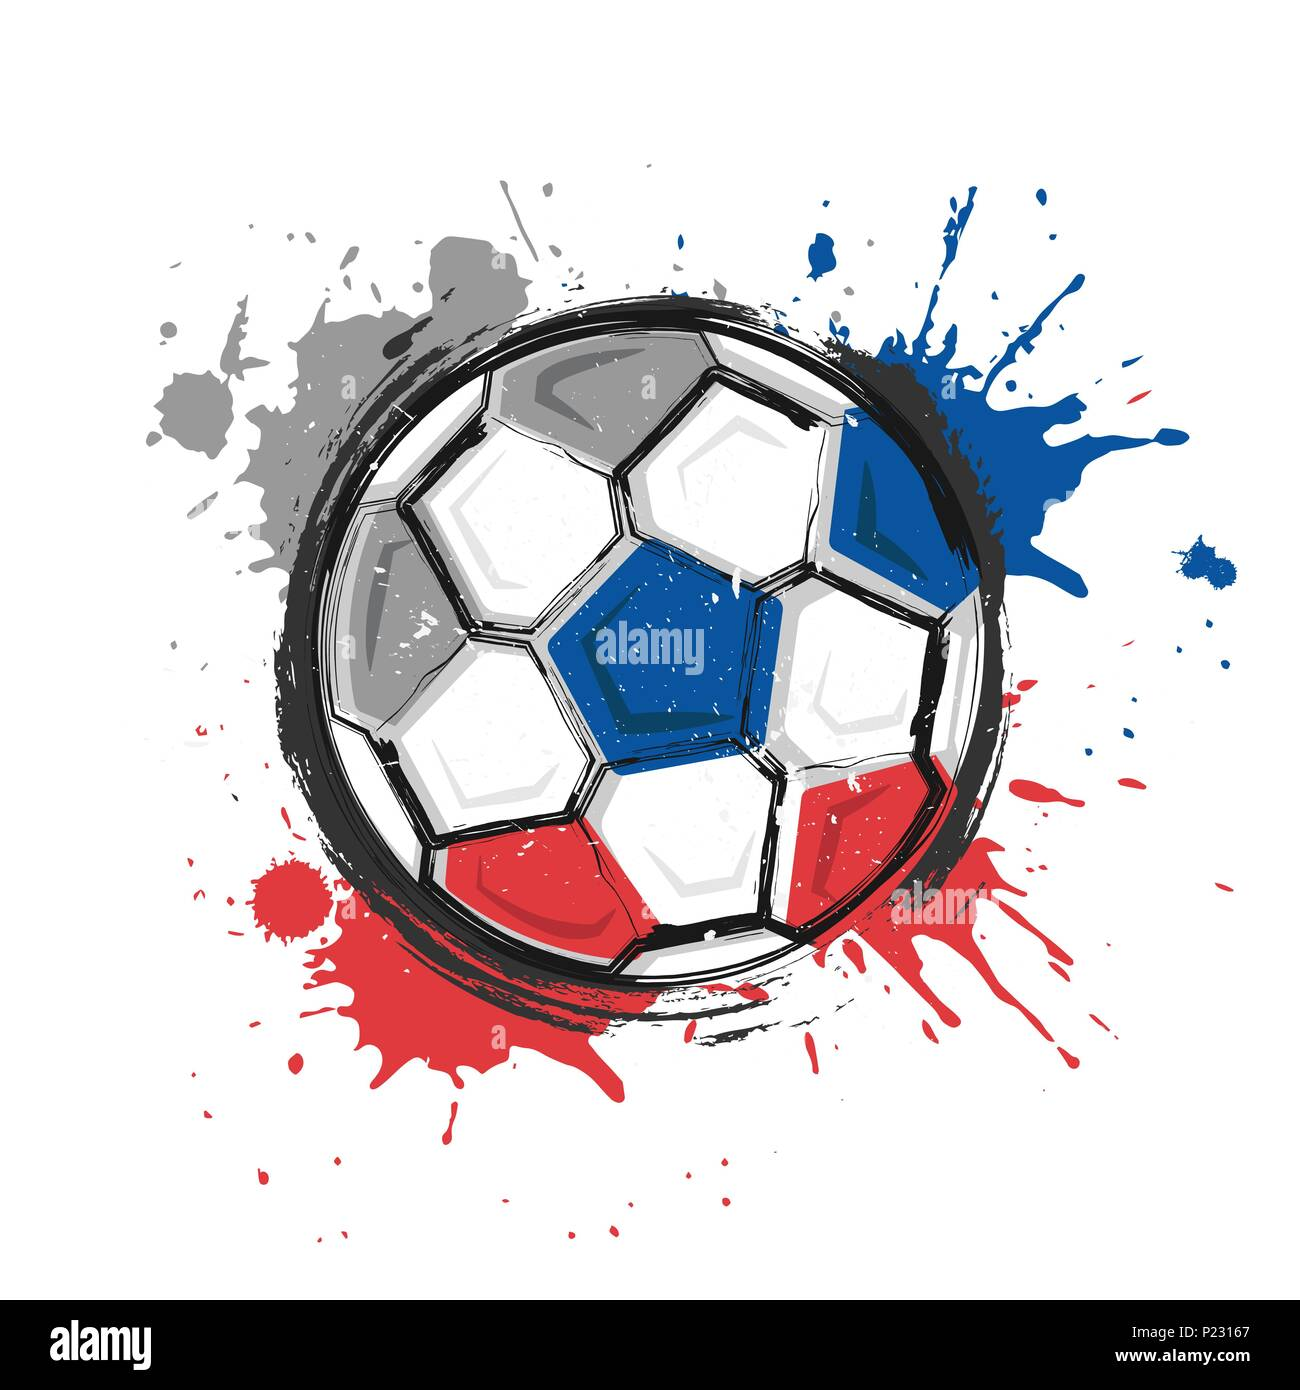 Russland Fussball Symbol Realistisches Aquarell Kunst Malen